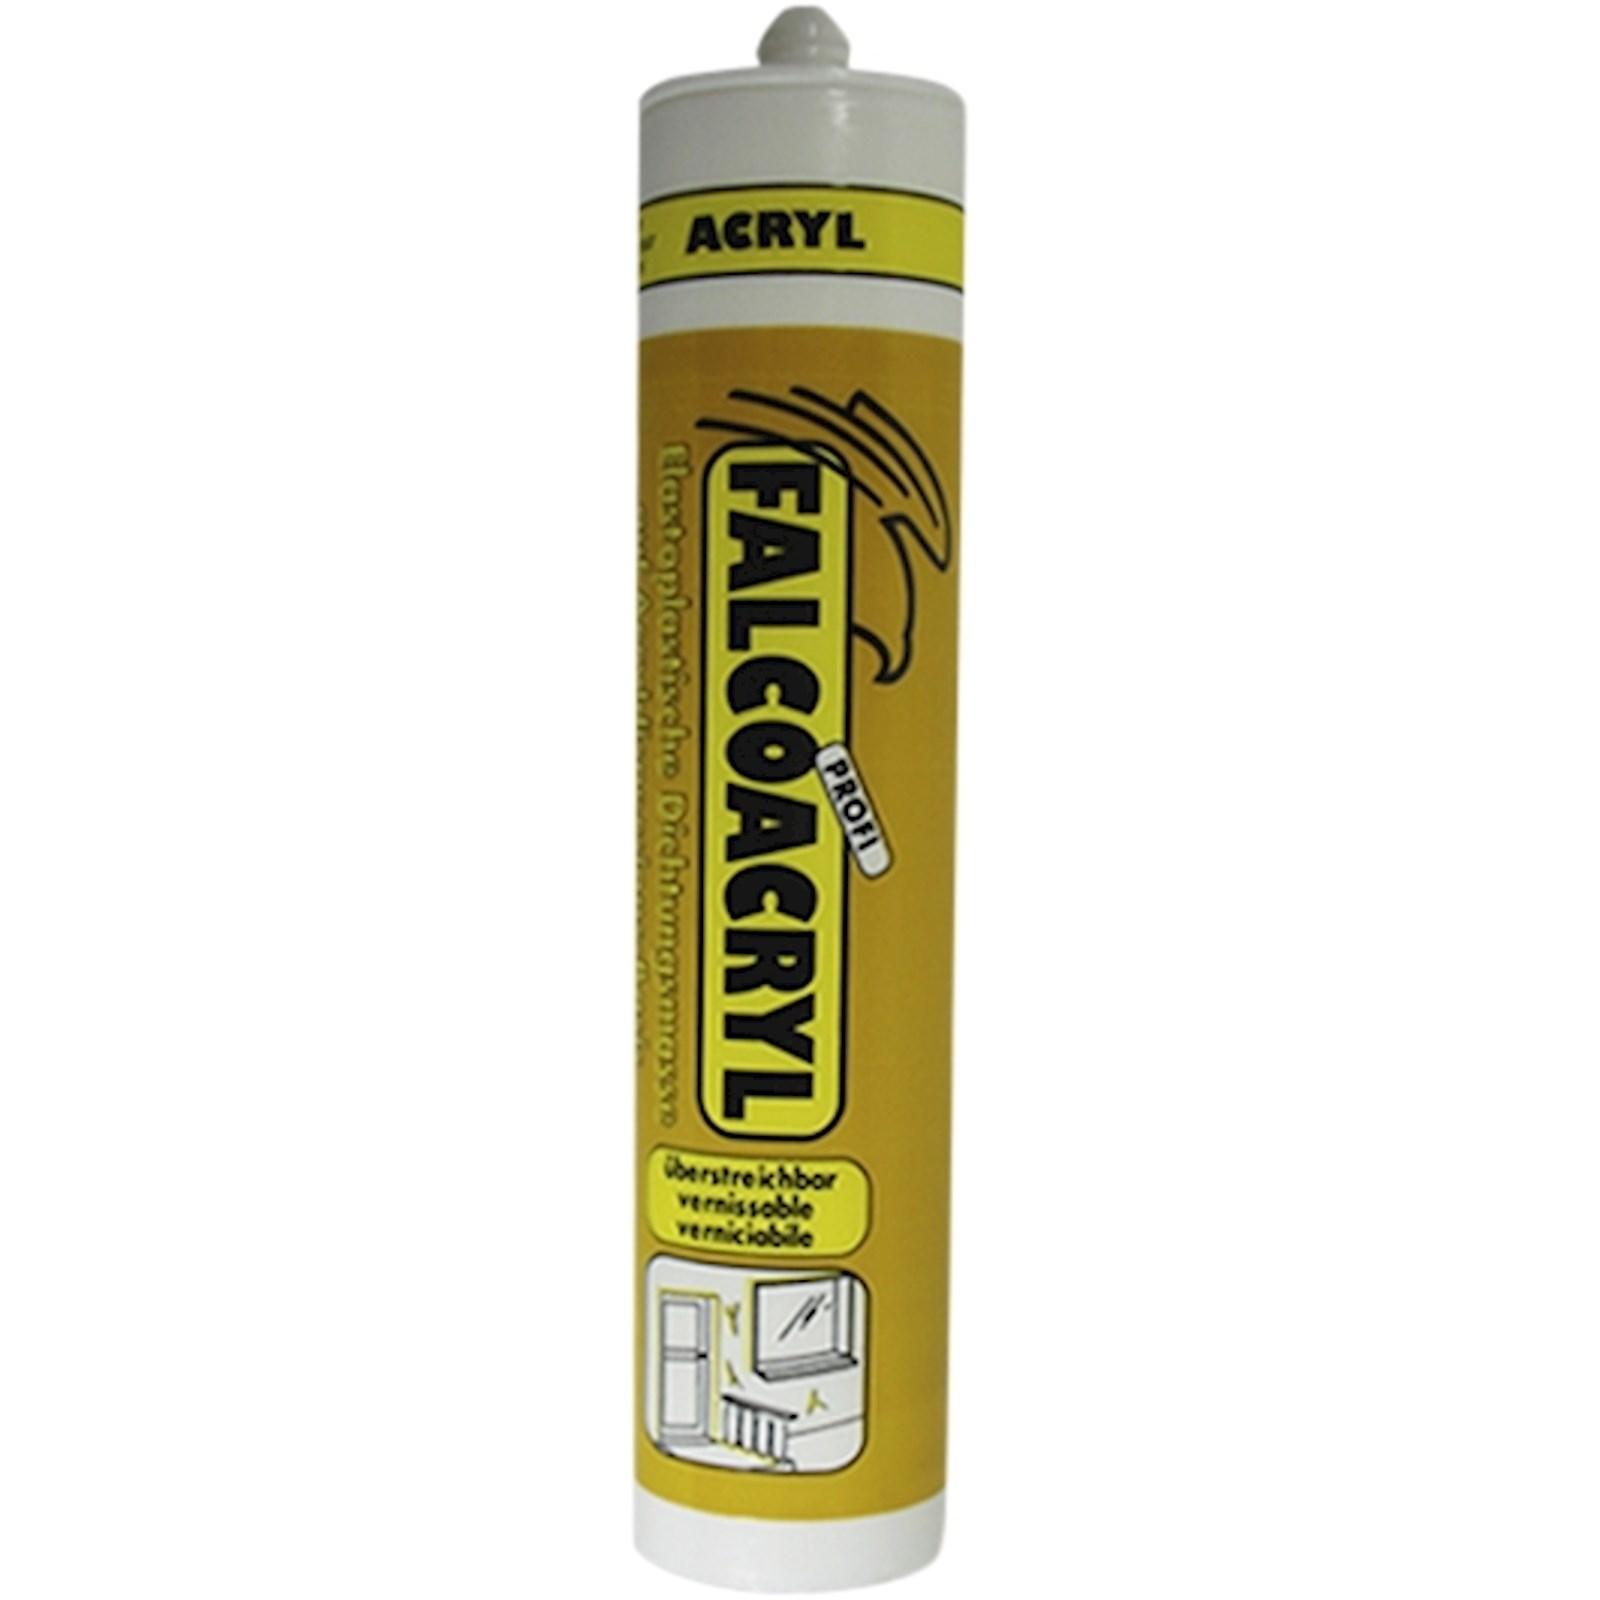 dichtmasse acryl weiss 310 ml - renovationsartikel - landi